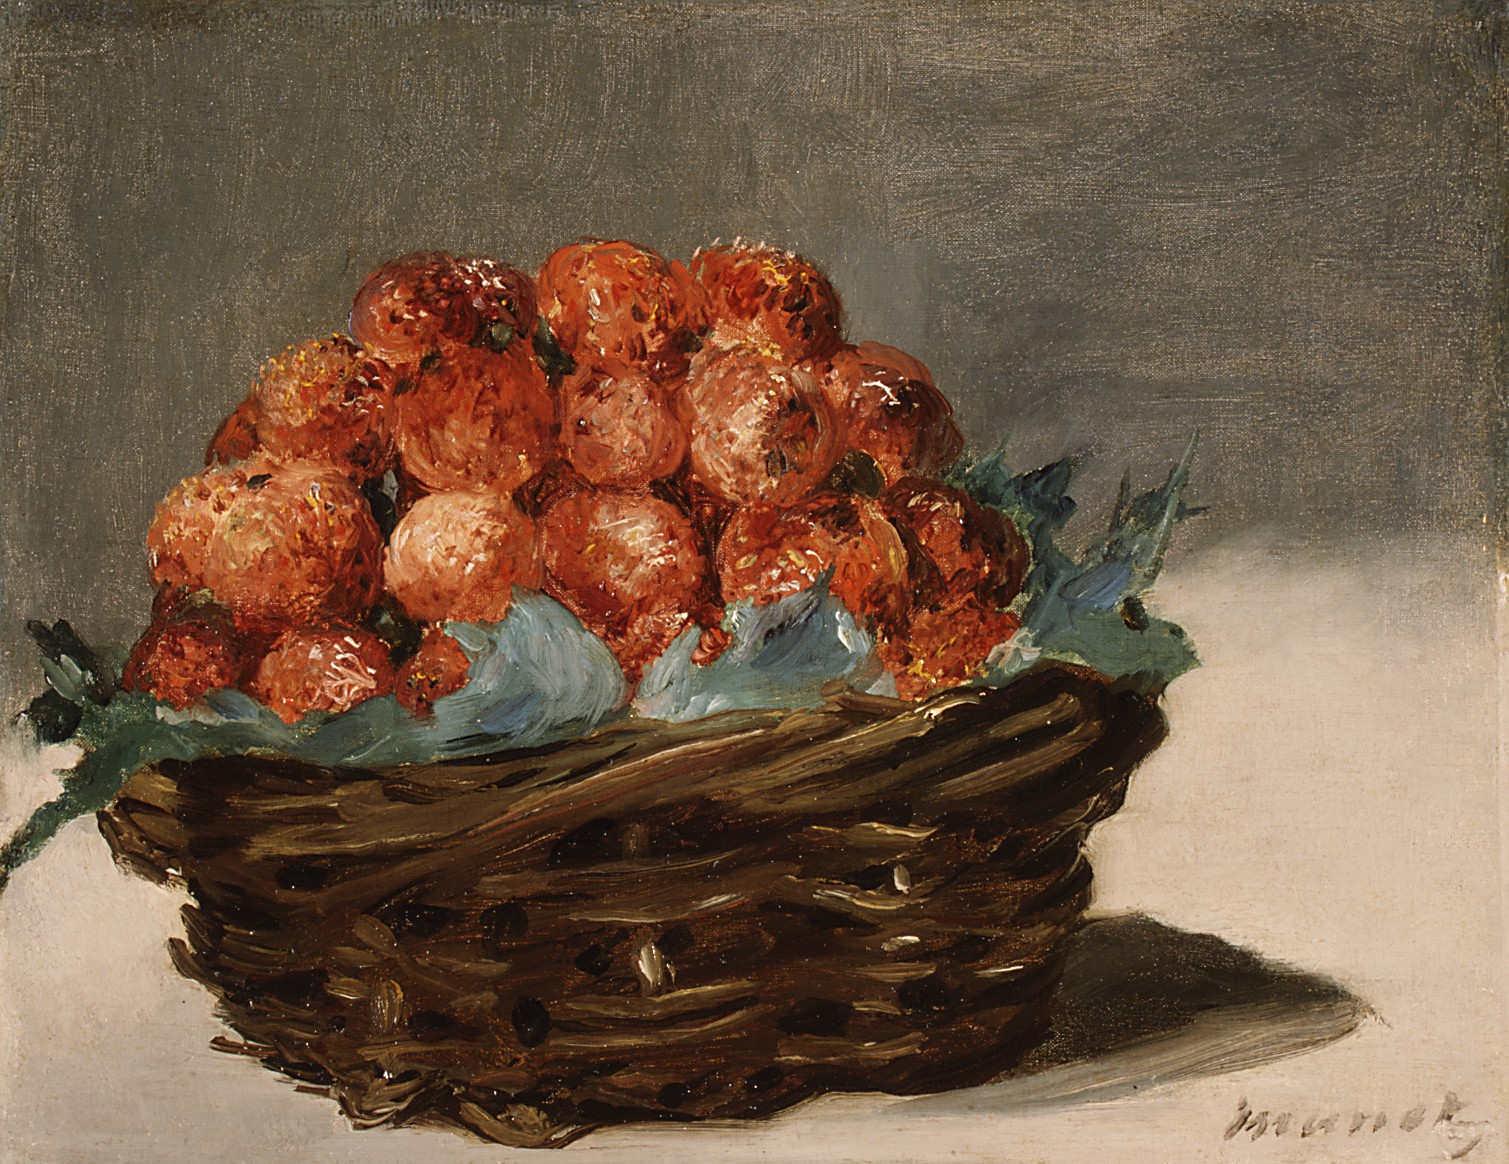 Edouard Manet, Erdbeerkorb, 1882, Öl auf Leinwand, 21,3 x 26,7 cm (The Metropolitan Museum of Art, New York, Gift of Mr. and Mrs. Nate B. Spingold, 1956)